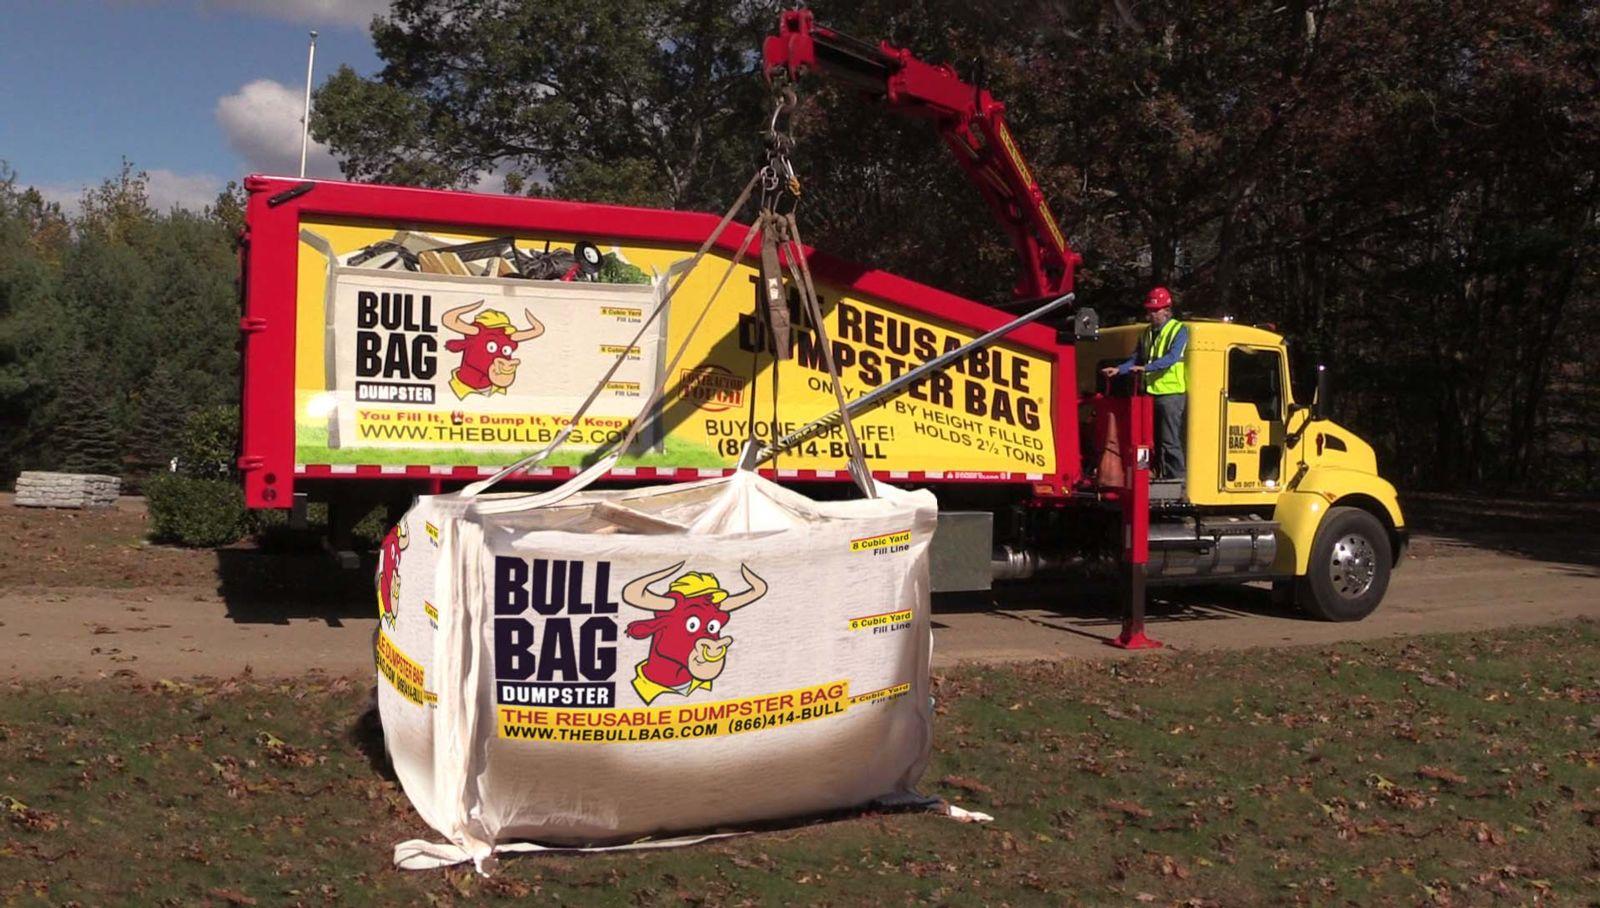 Bullbag Advantages Dumpster Bag Pickup South Florida The